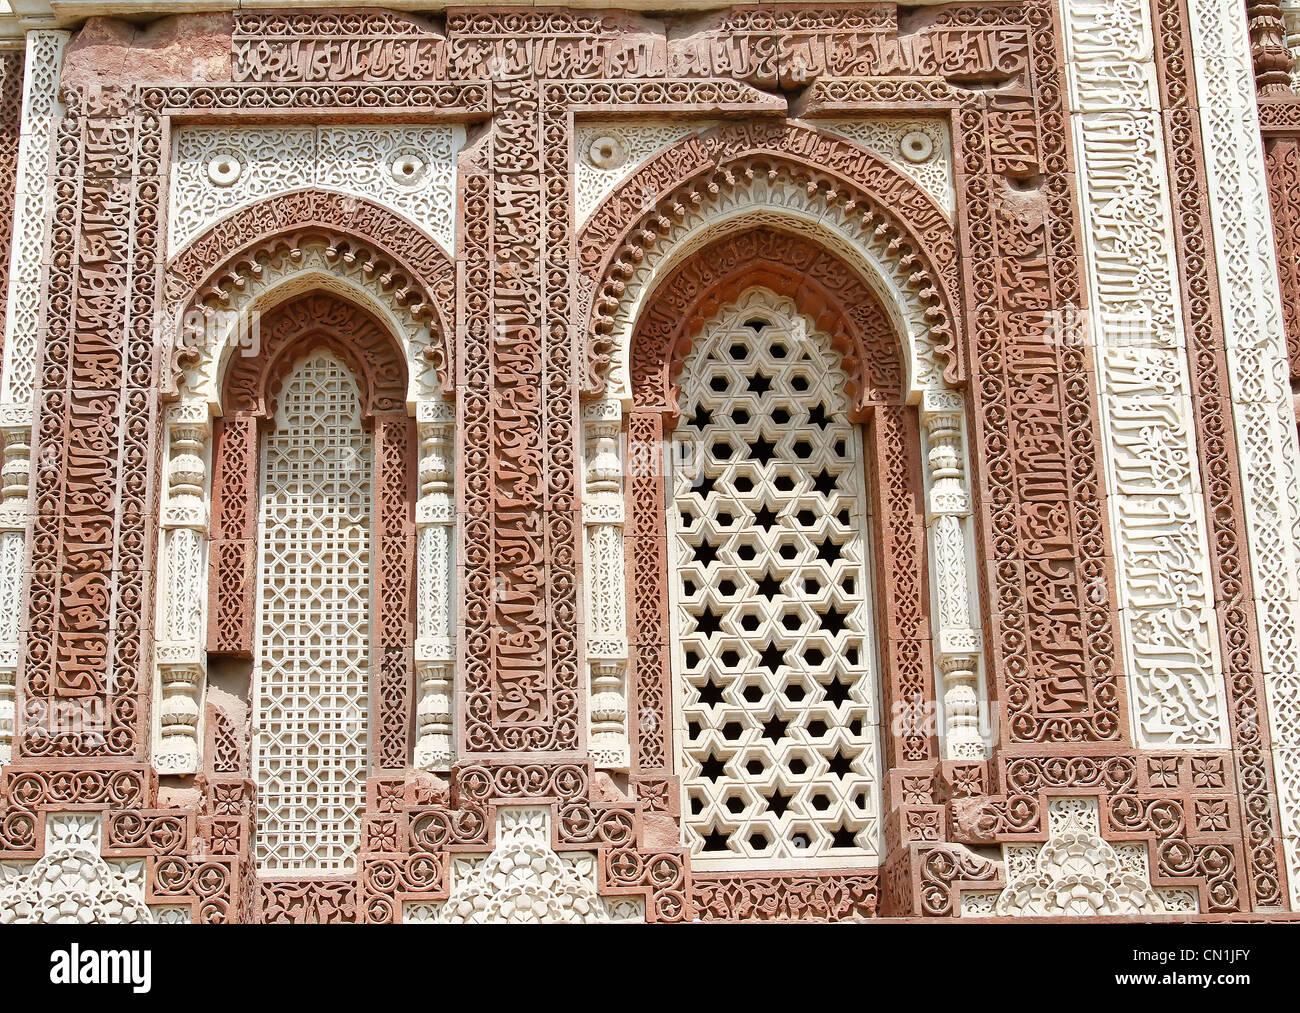 indo islamic architecture background stock photo 47365023 alamy